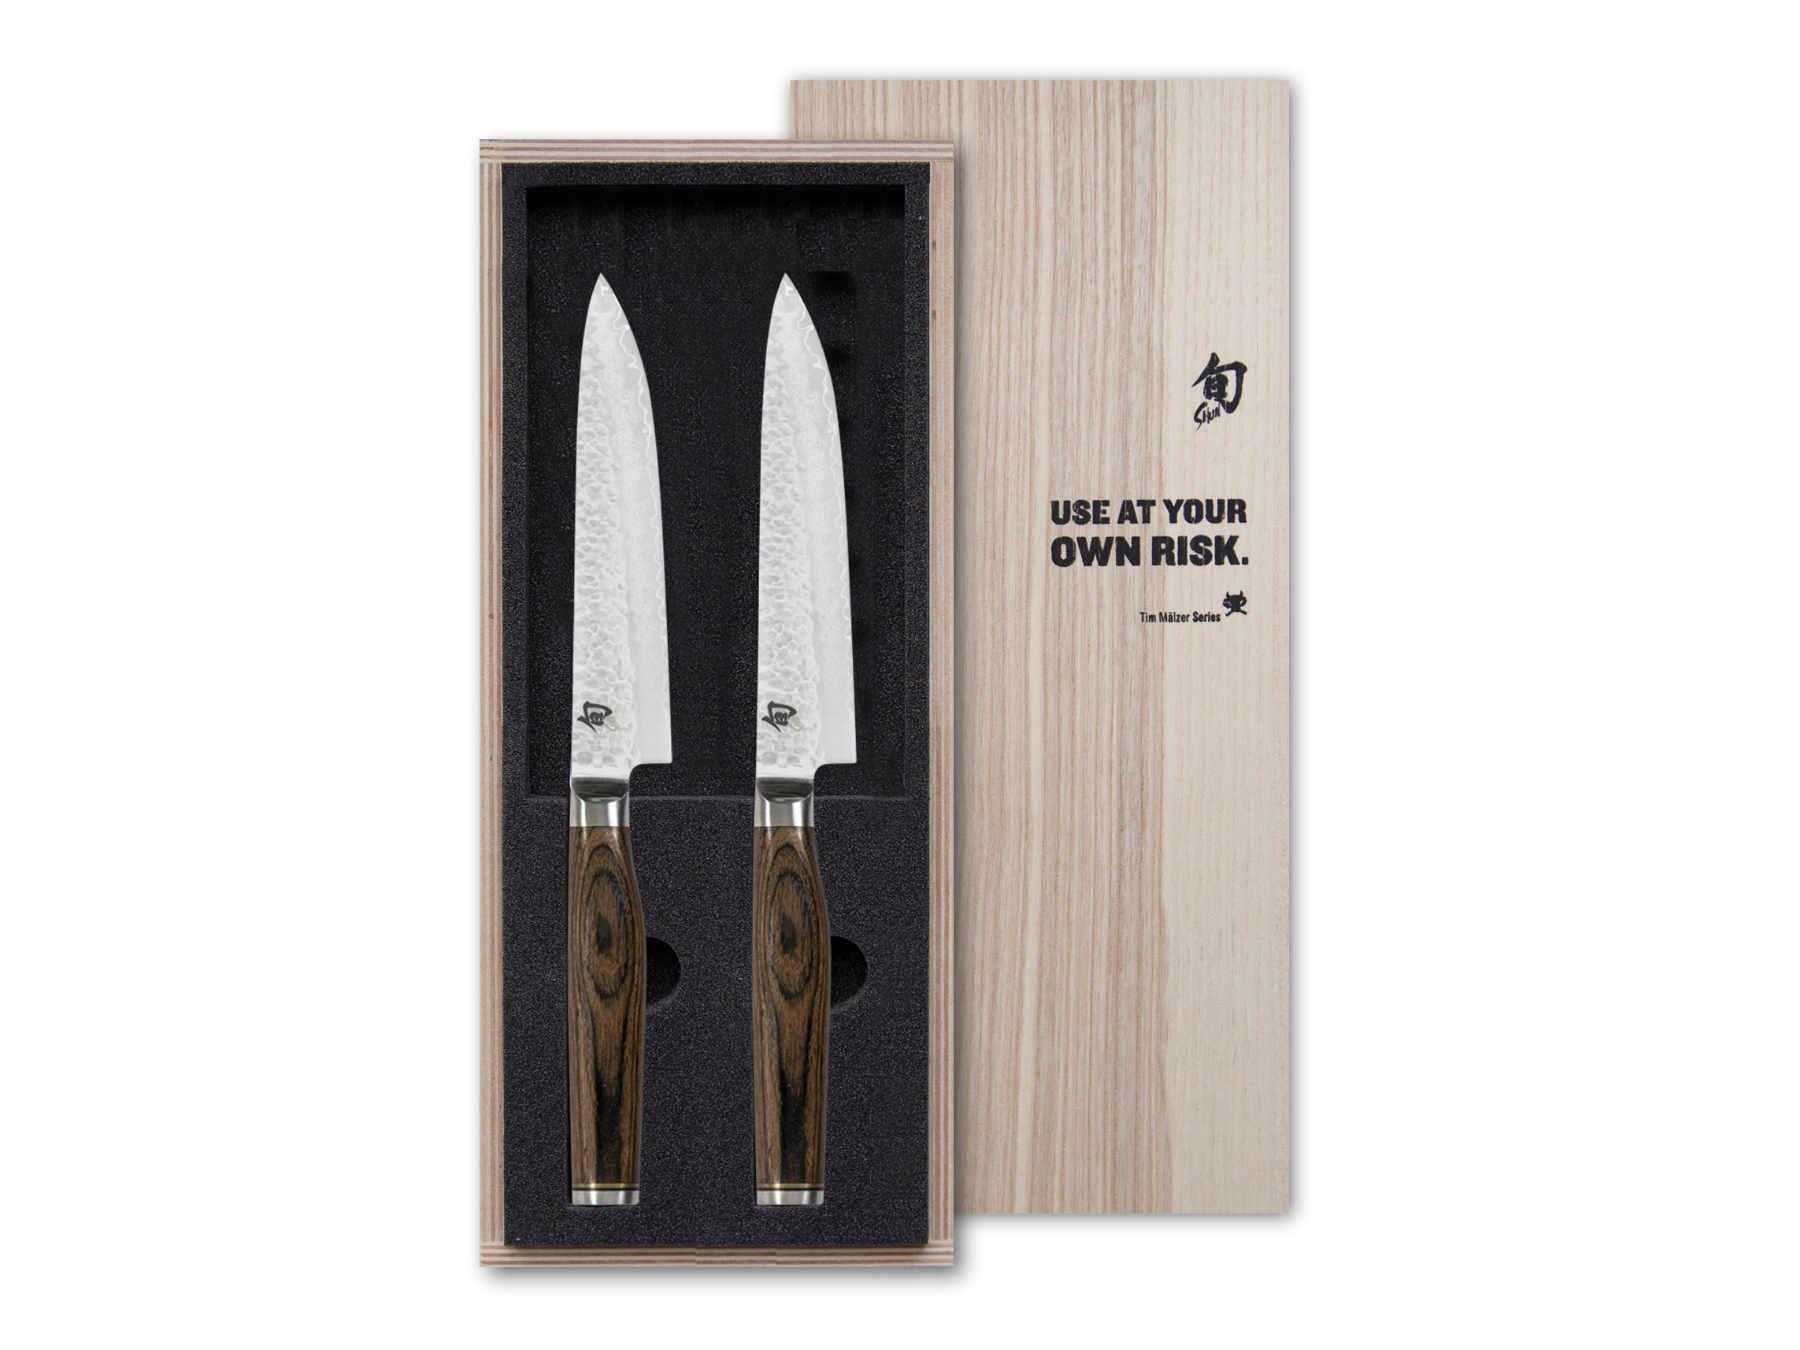 KAI Shun Premier TDMS-400 Steakmesser Set 2 teilig